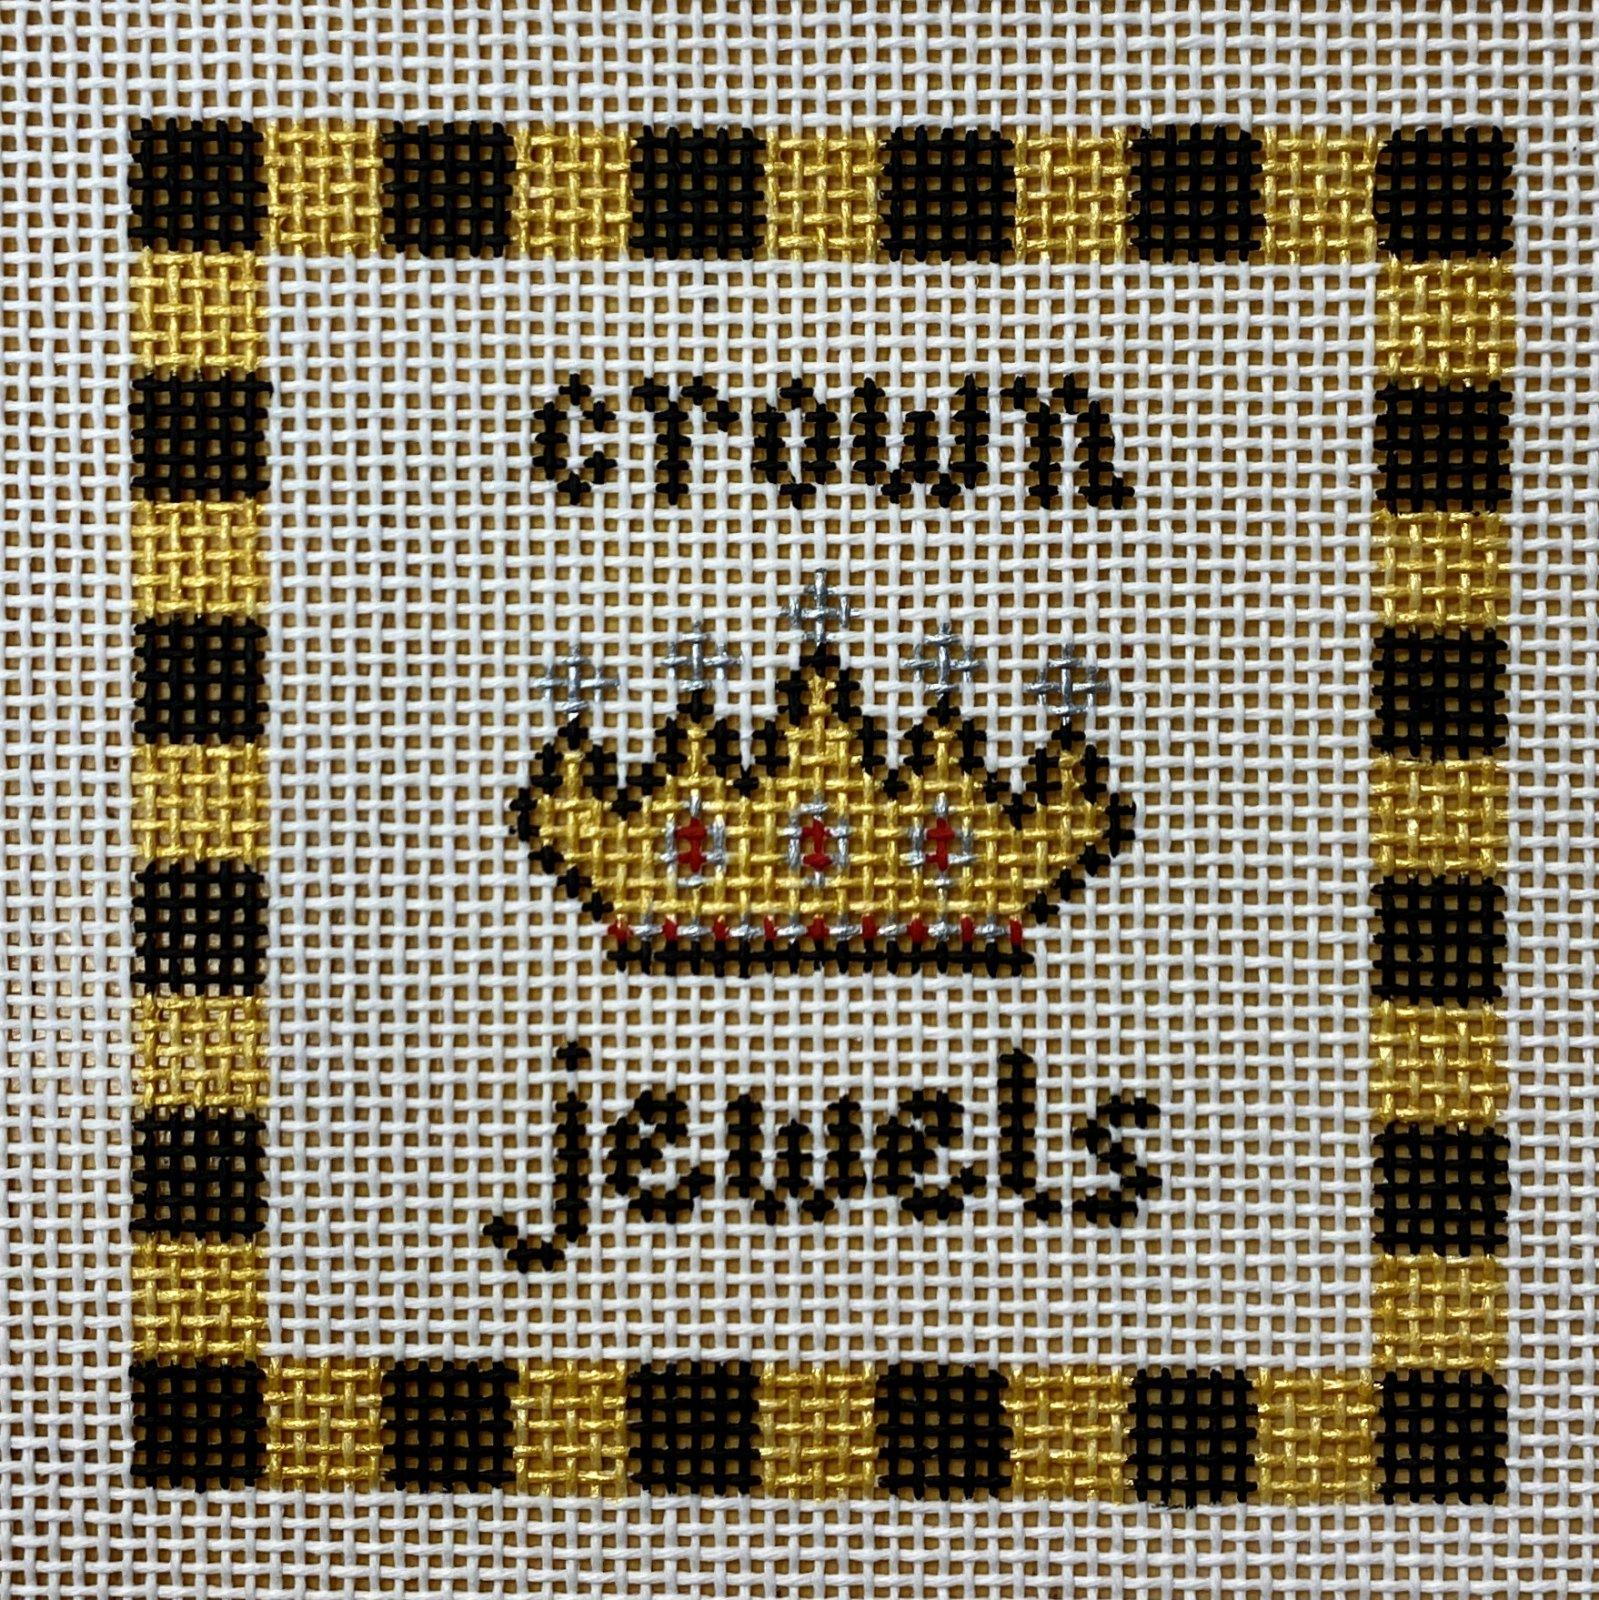 crown jewels, black